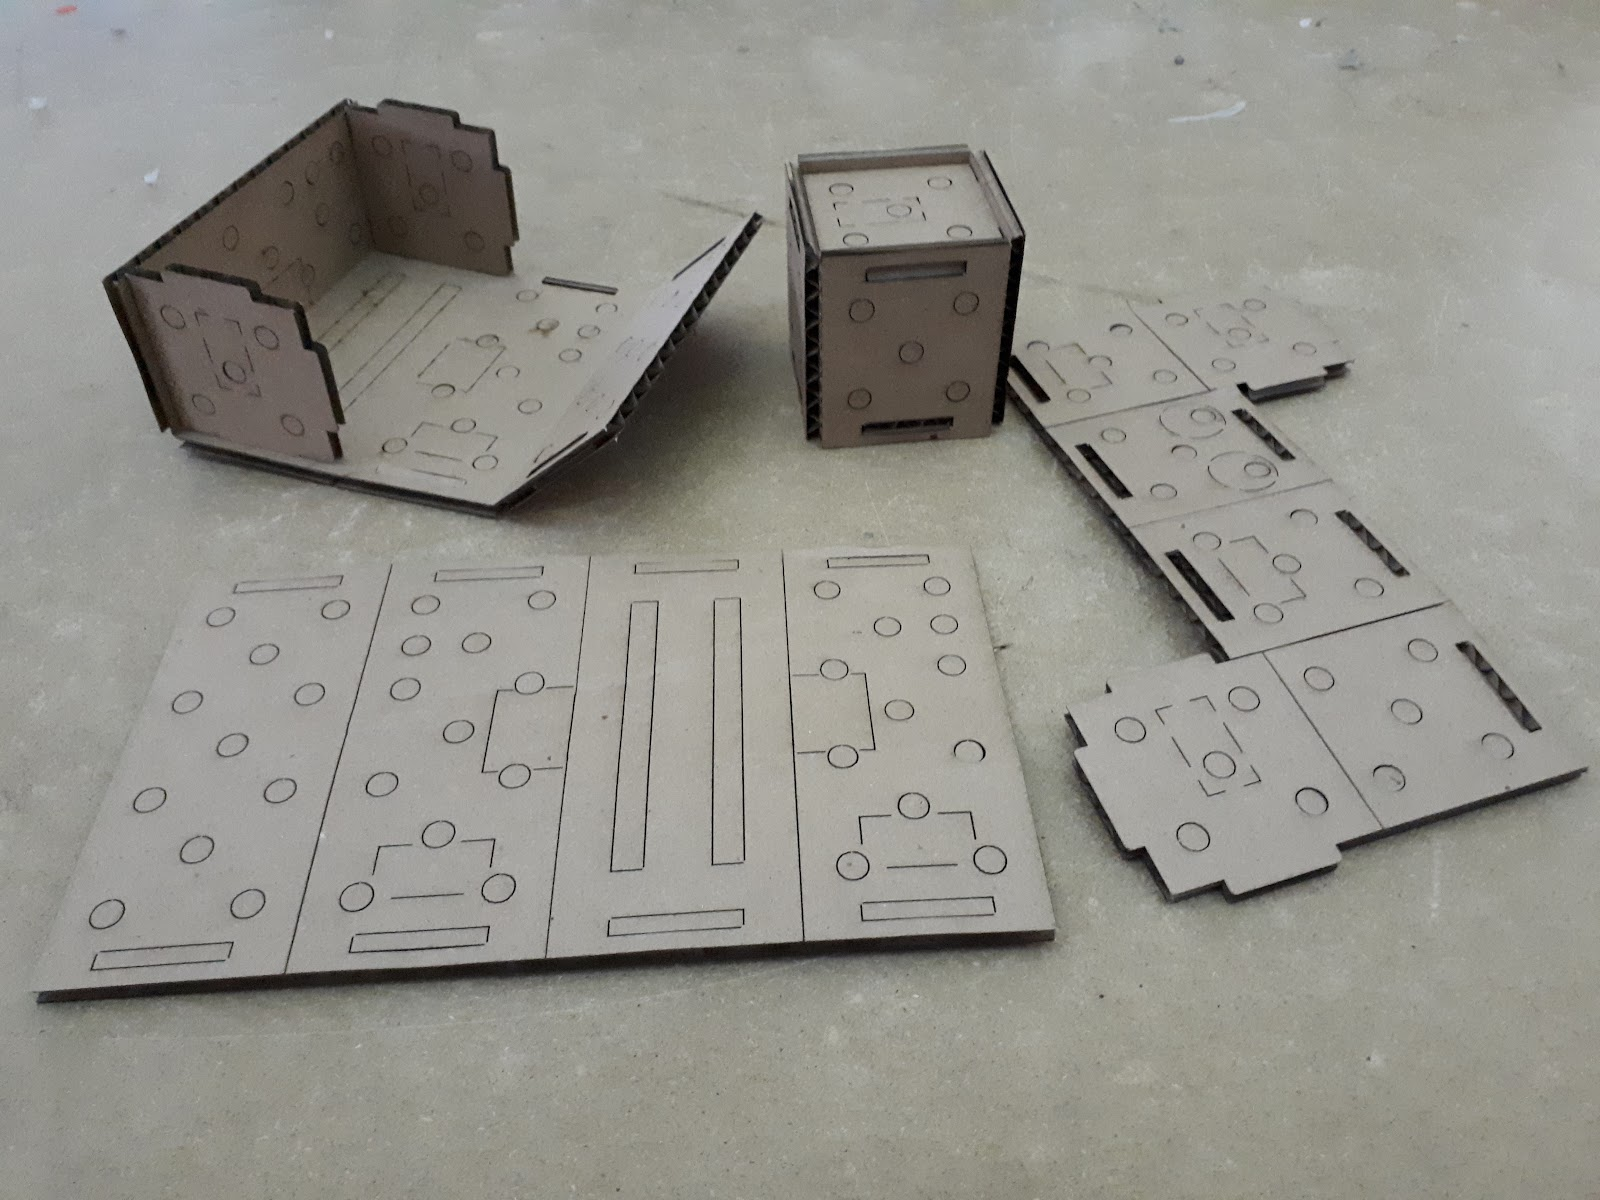 Laser Cut Cardboard Robot Construction Kit | Hackaday io